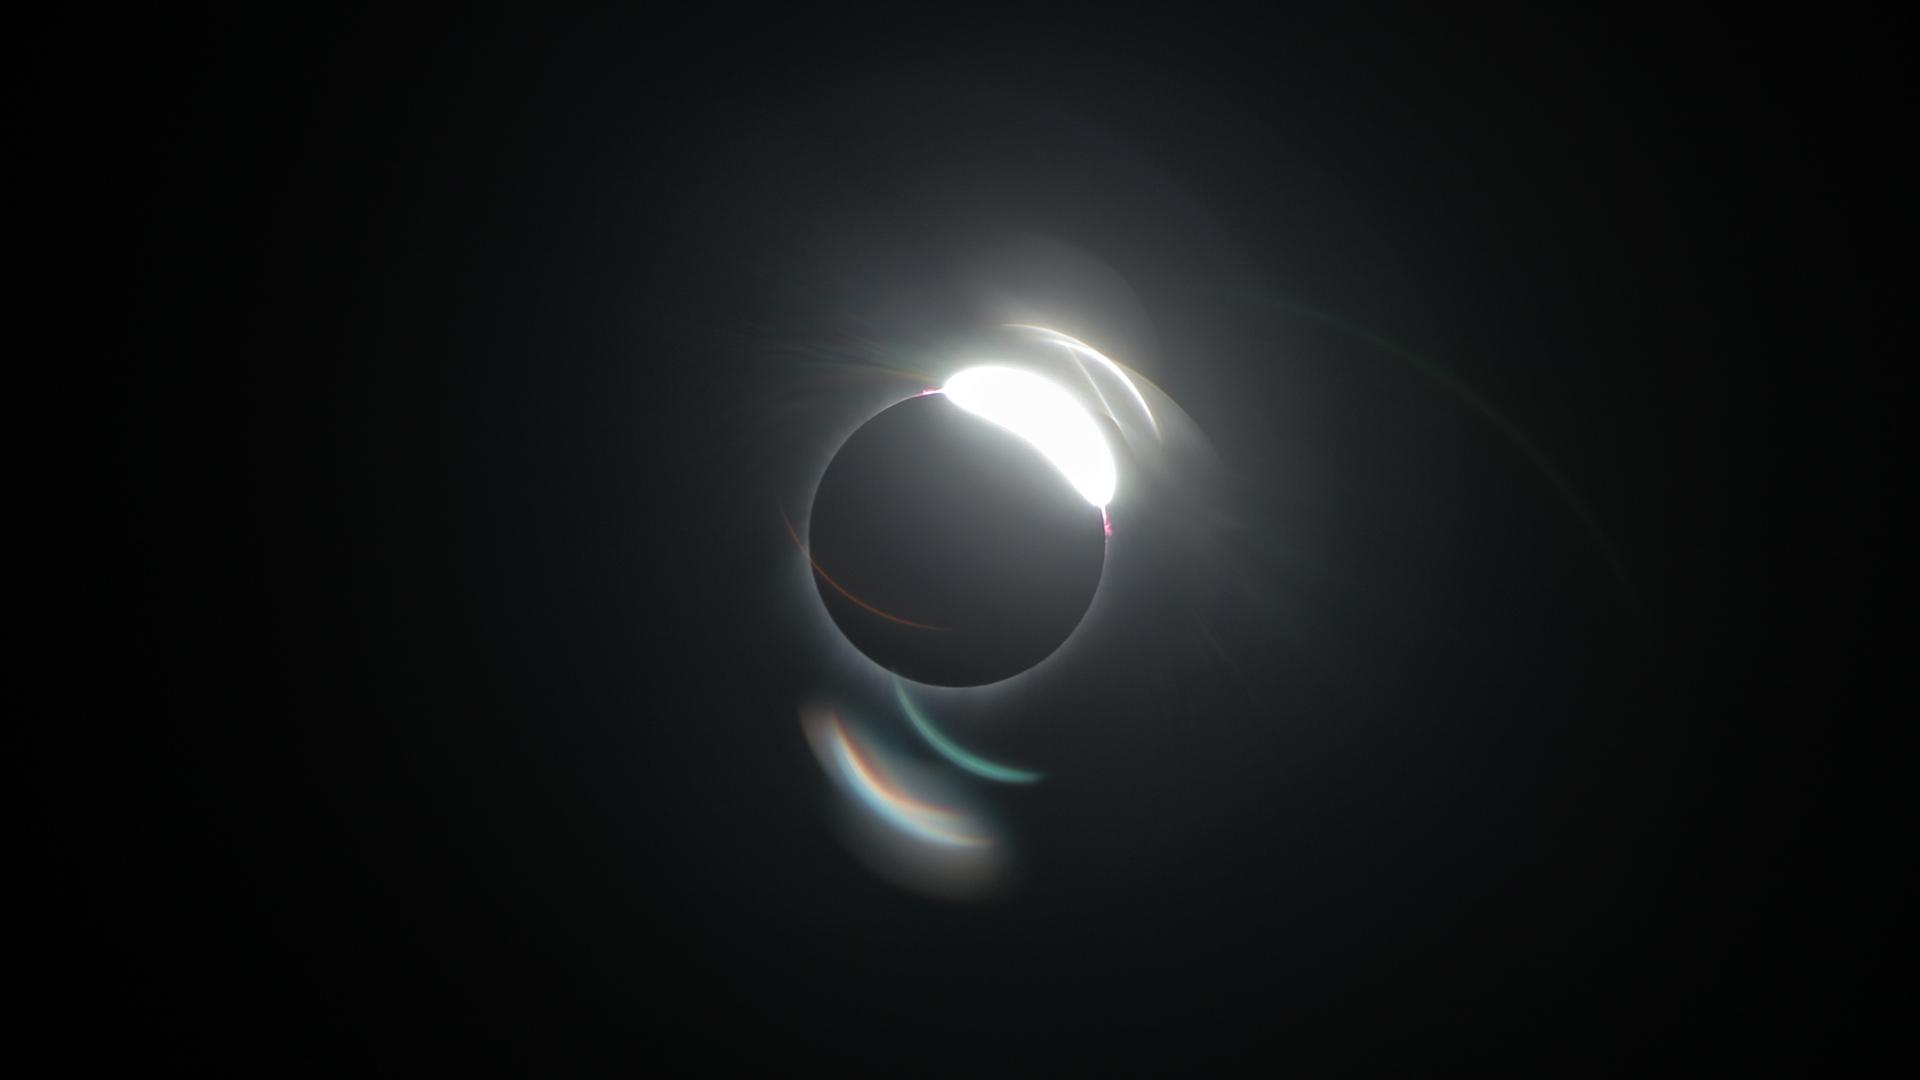 171023_EXP_Eclipse_Thumb.jpg